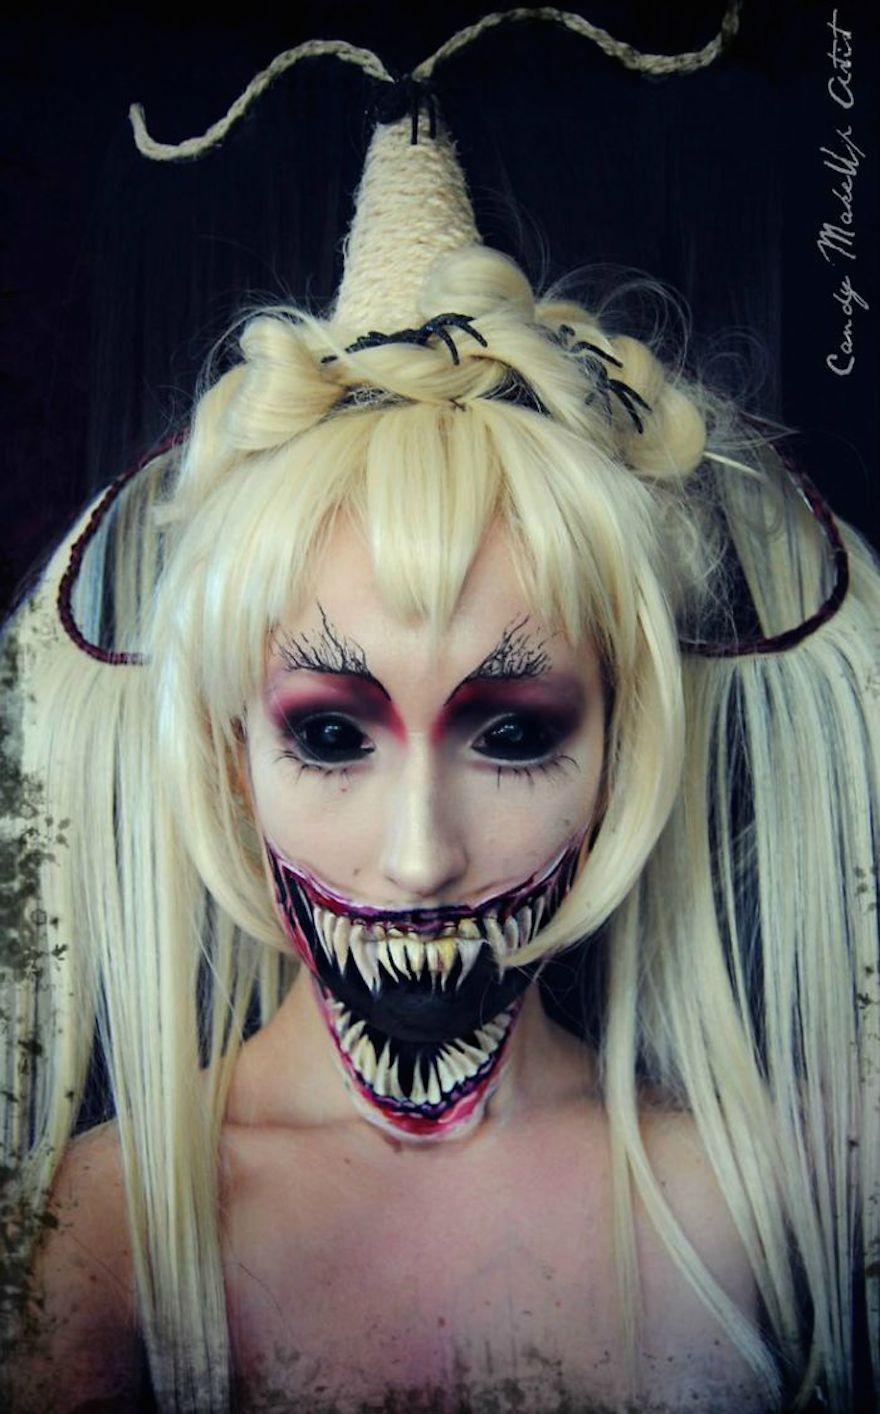 Creative/terrifying Halloween make up ideas